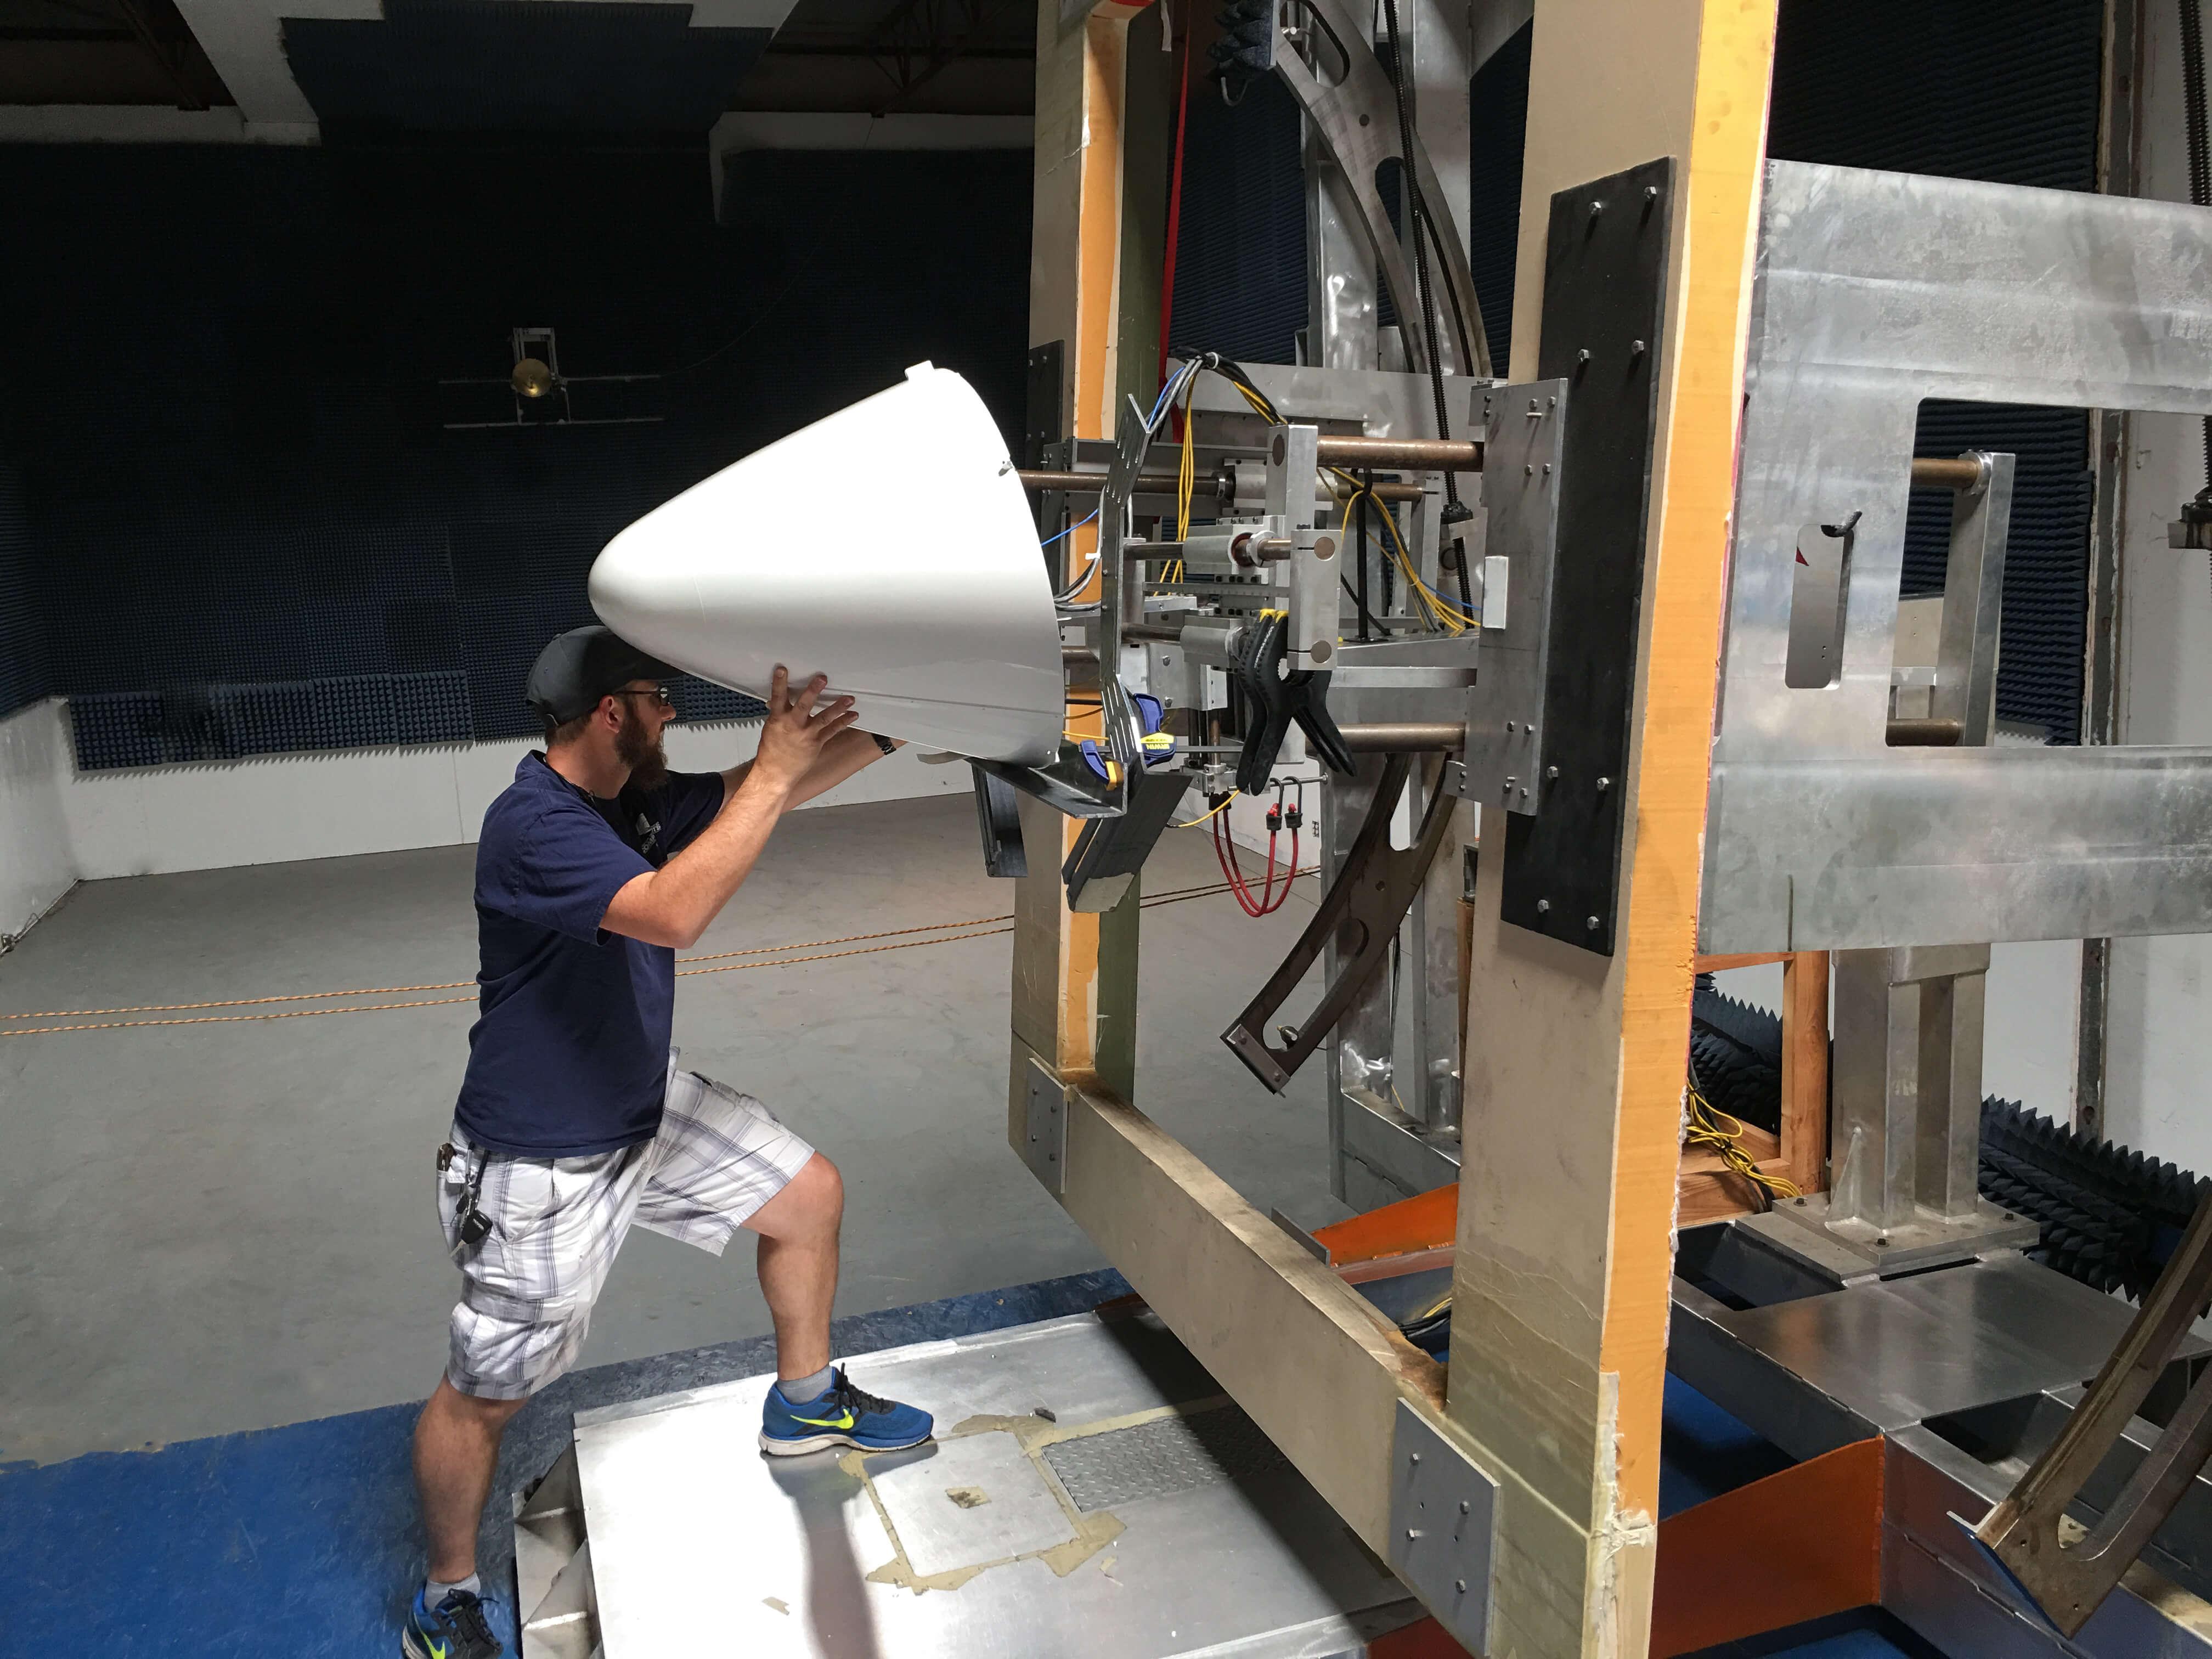 Installing a EMB145 Radome on the radar range for testing